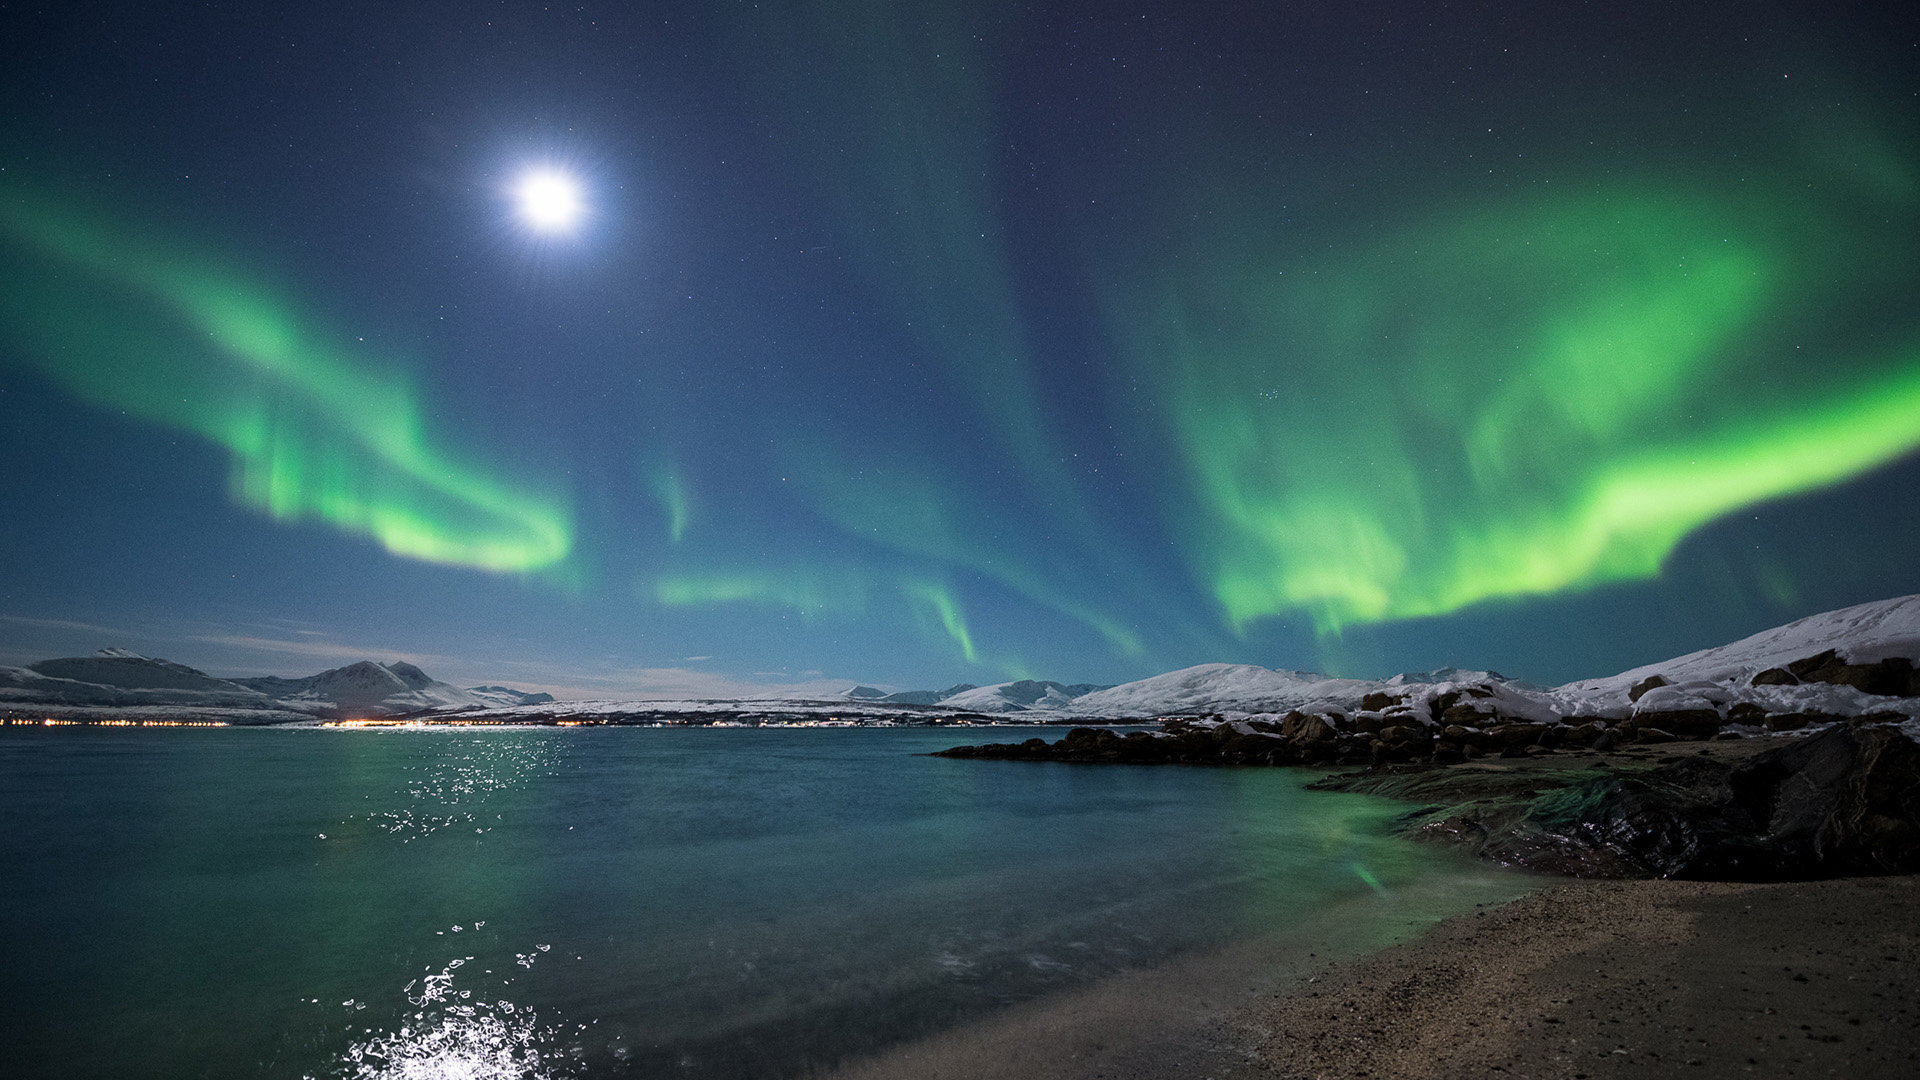 high resolution aurora borealis full hd 1920x1080 wallpaper id